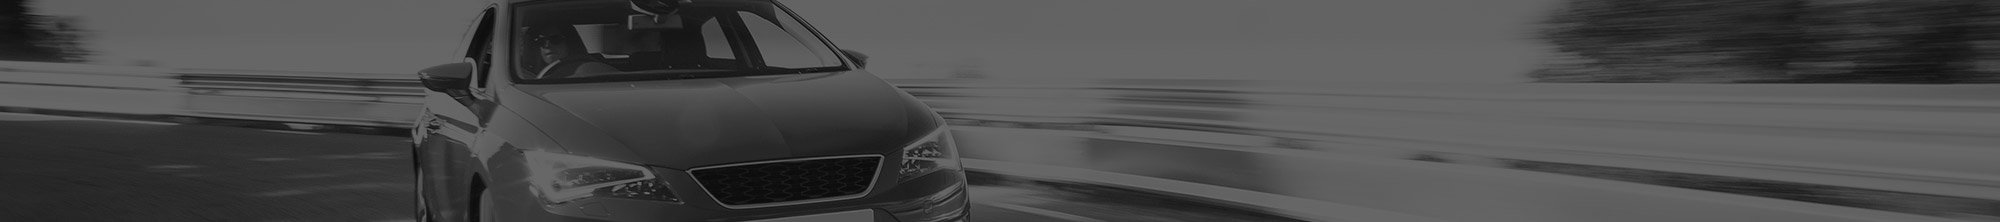 BAIGTS AUTOMOBILES